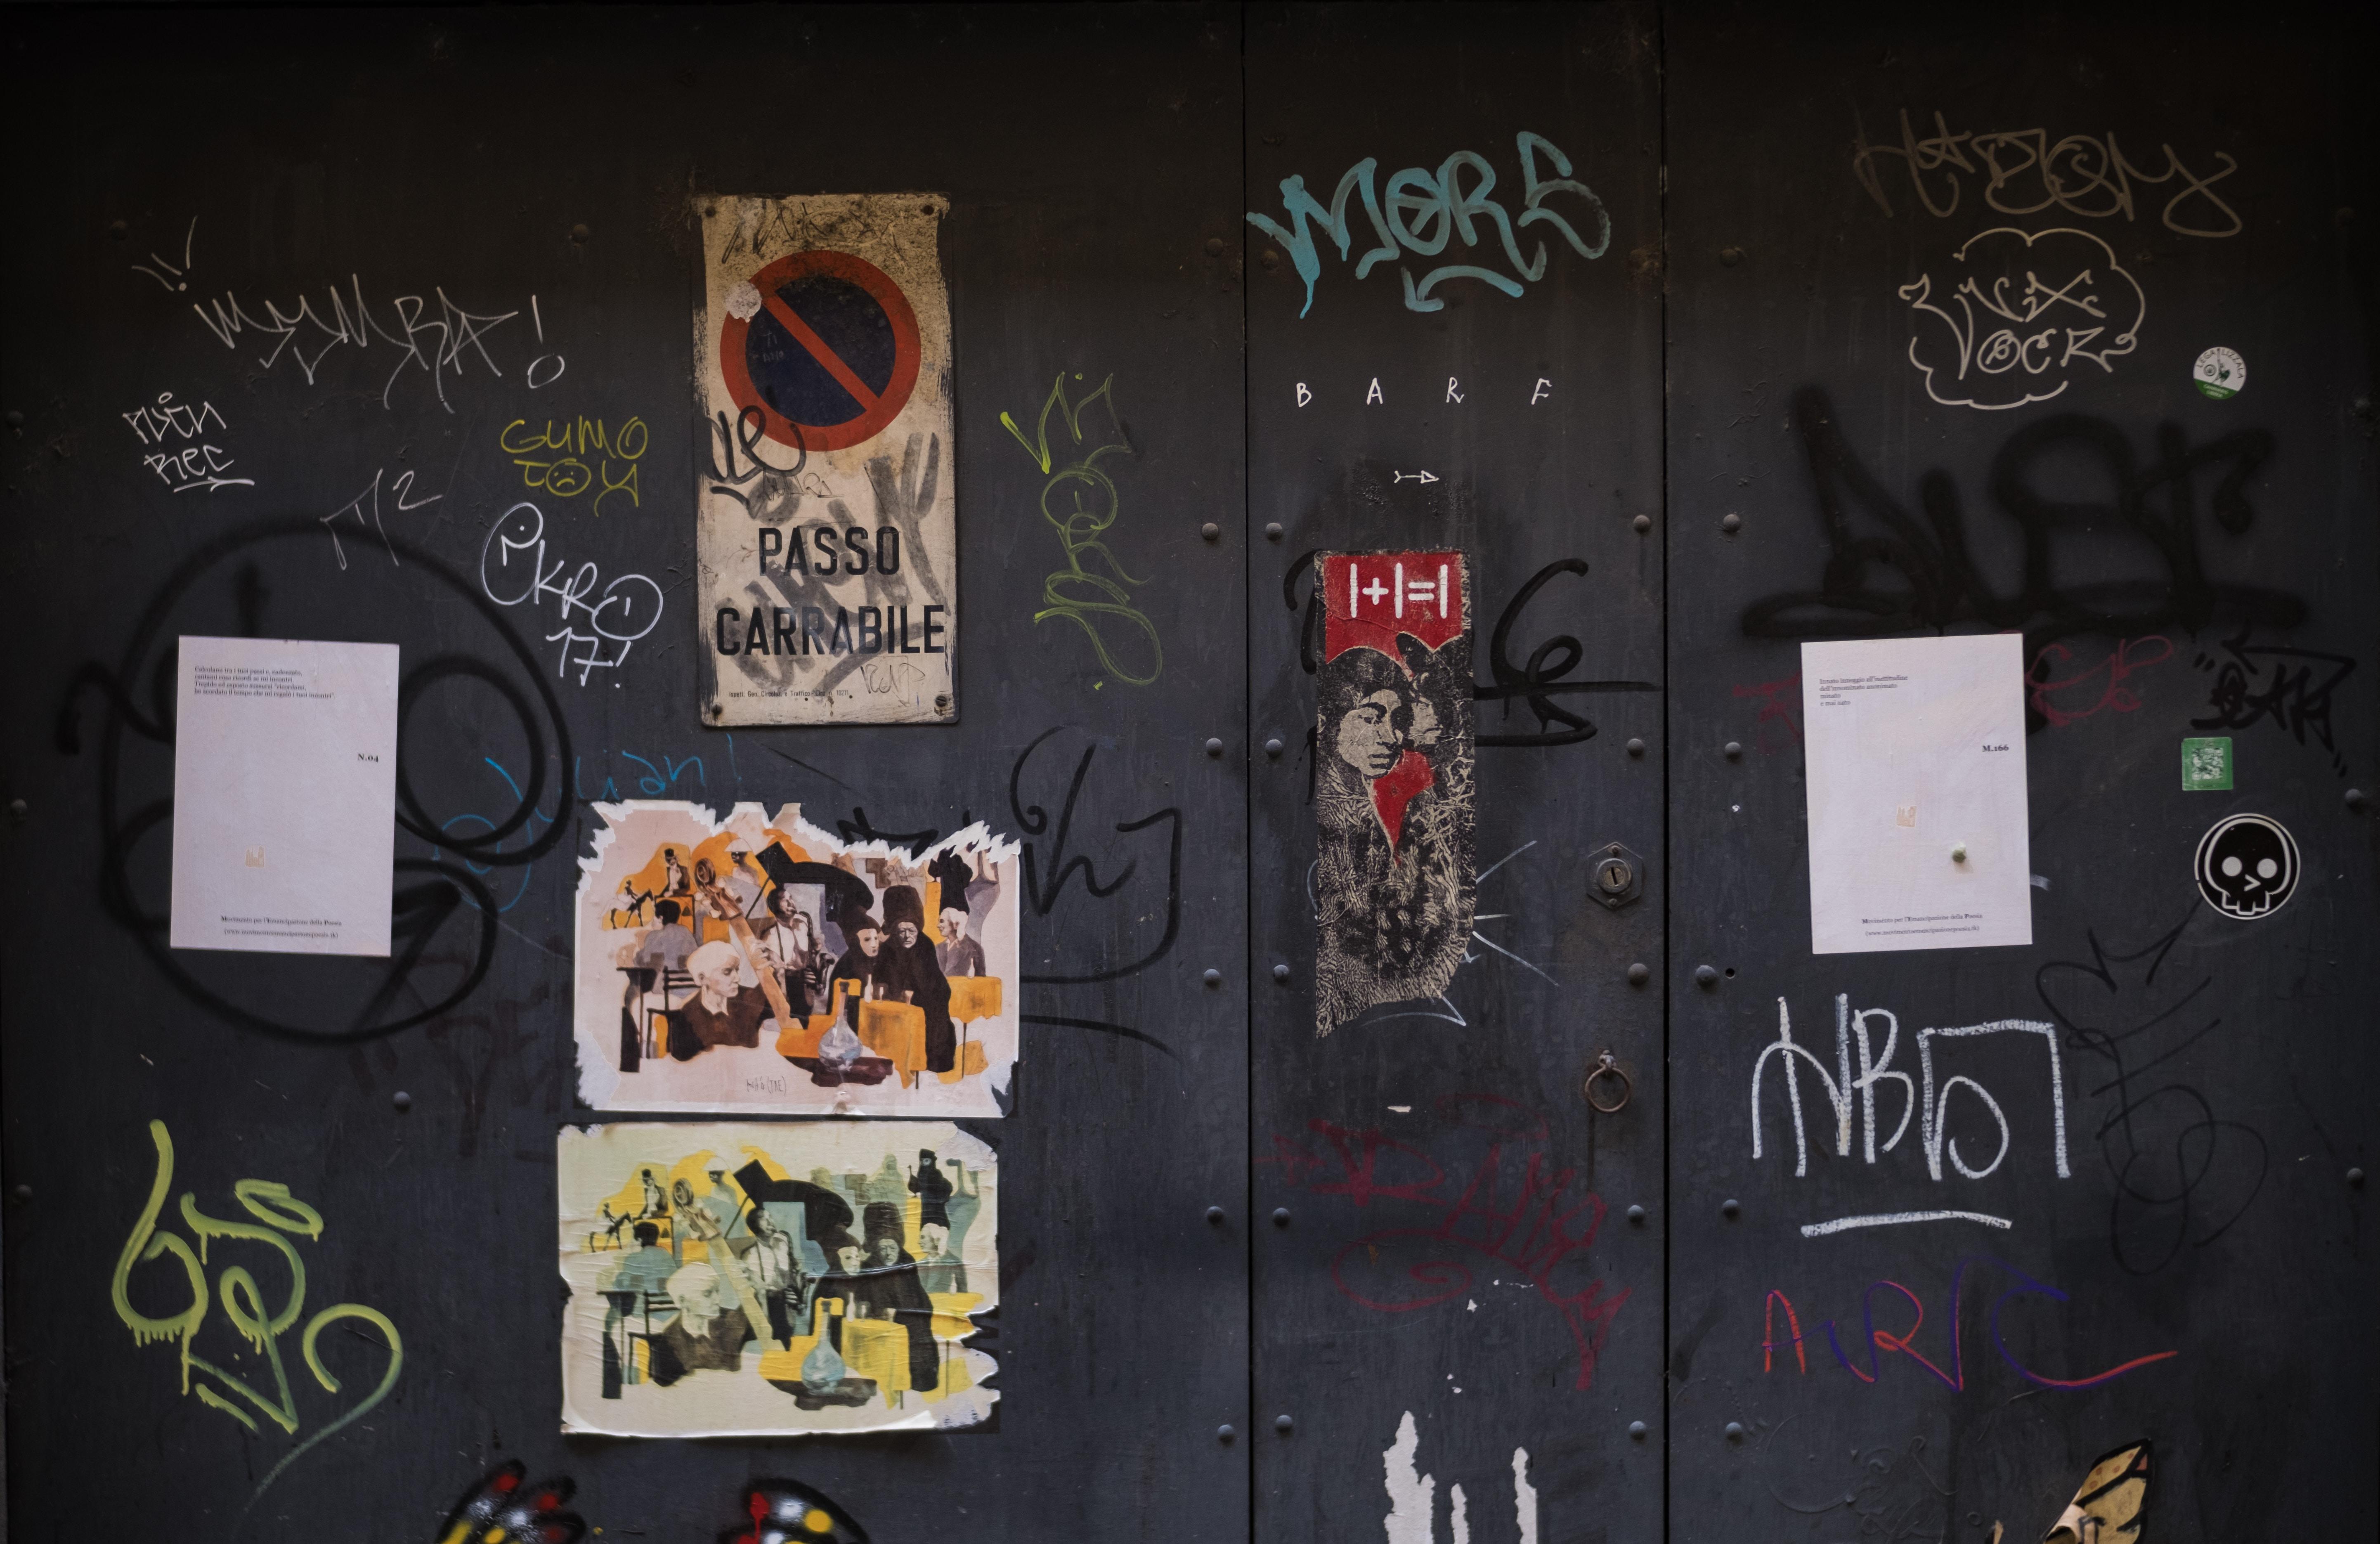 gray wall with graffiti